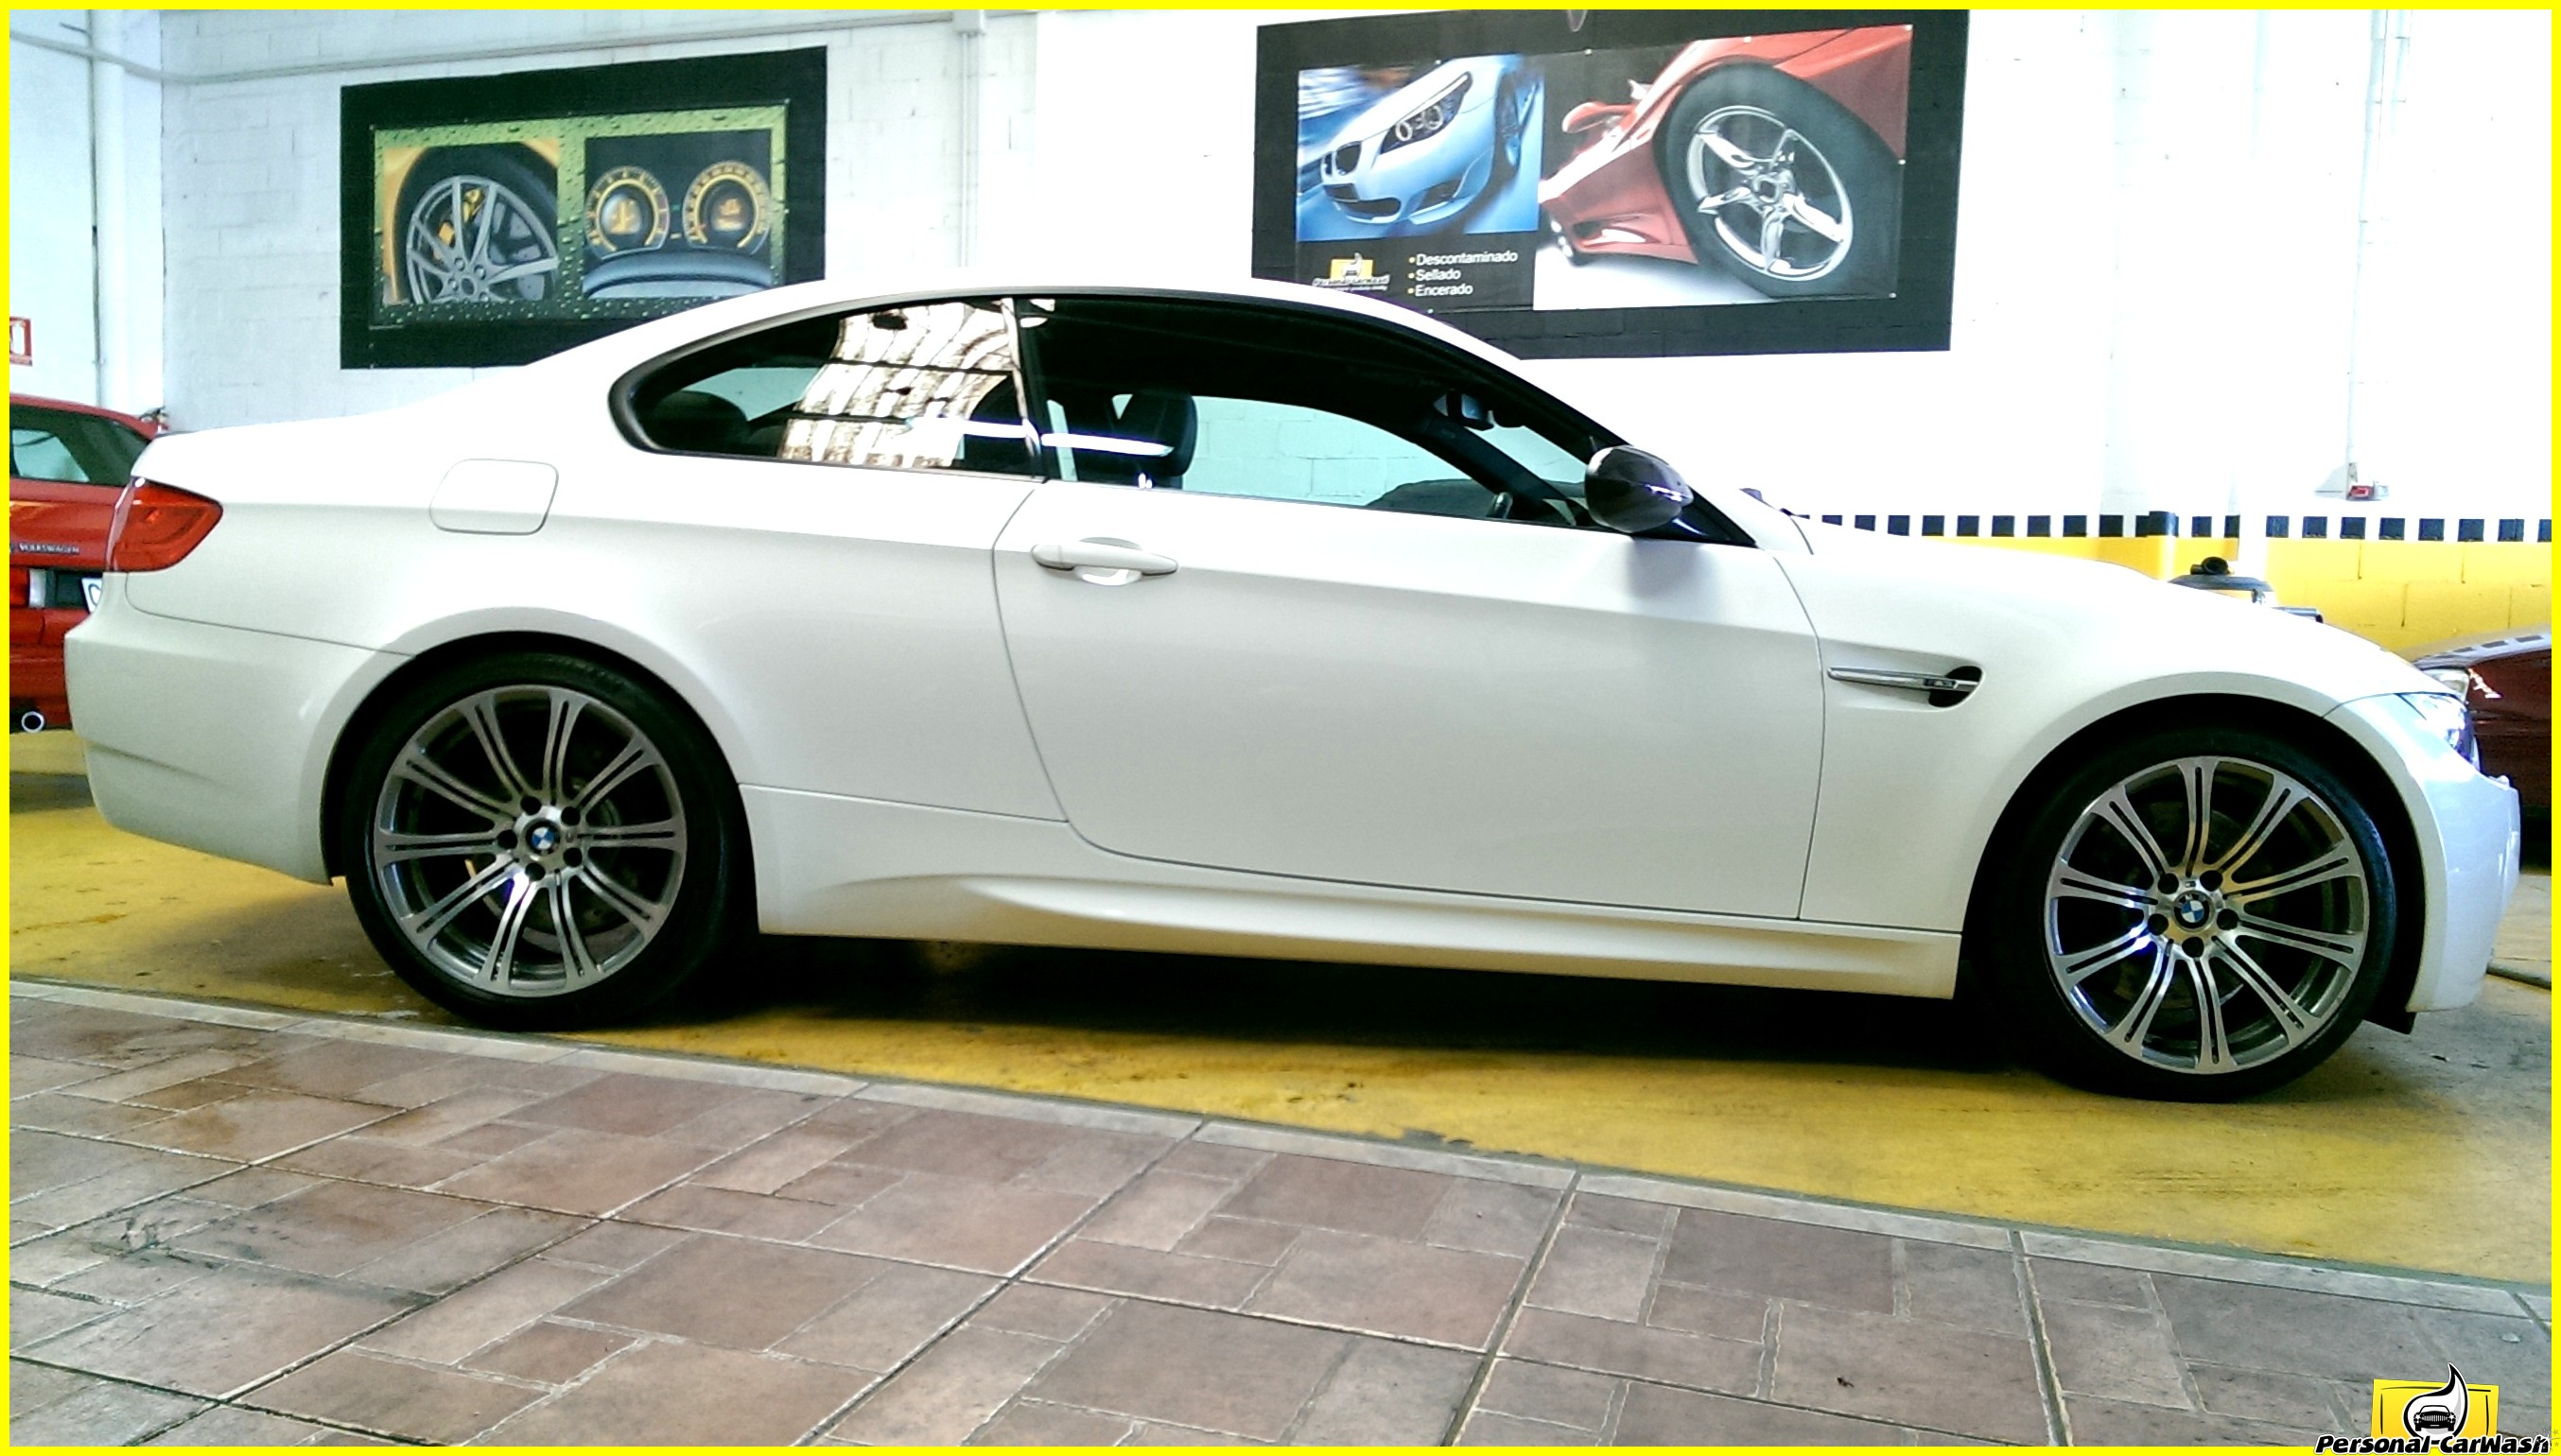 BMW M3. Pulido y Tratamiento cerámico (Coating).